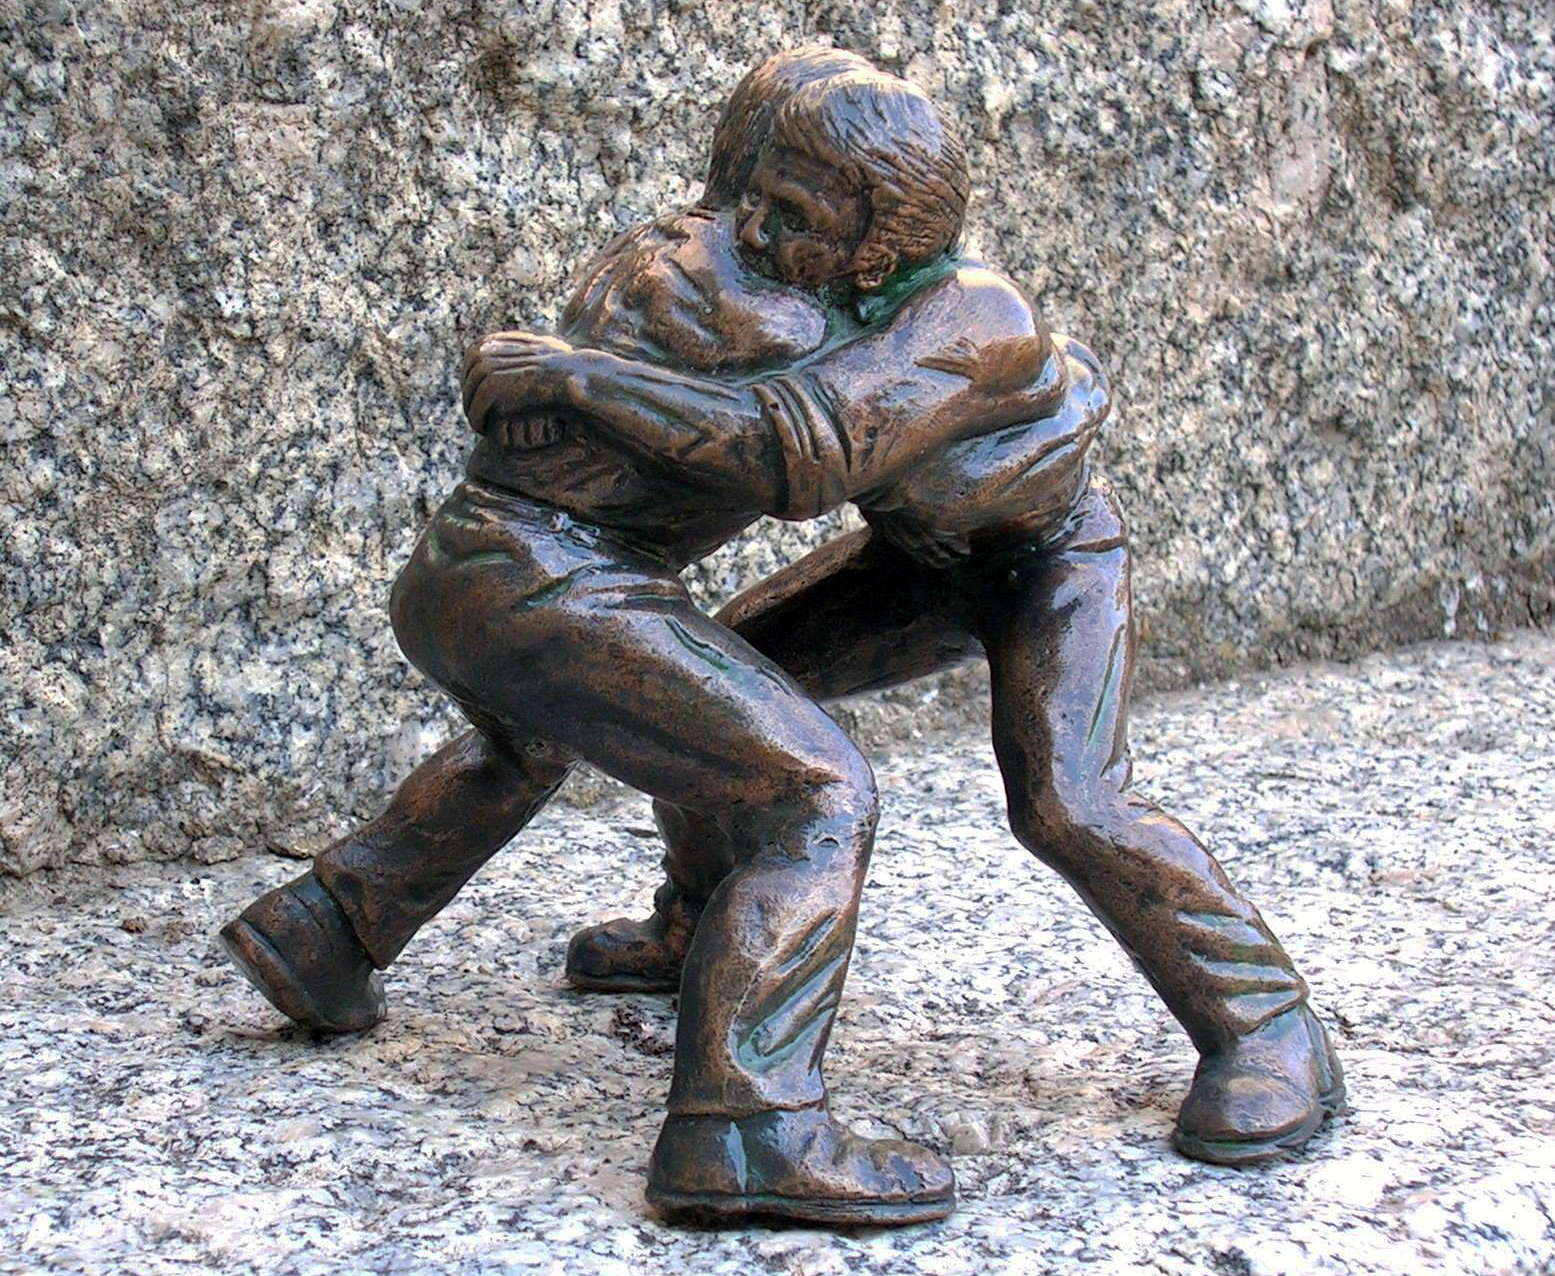 Sa Strumpa: the persistence of ancient cultures of sports